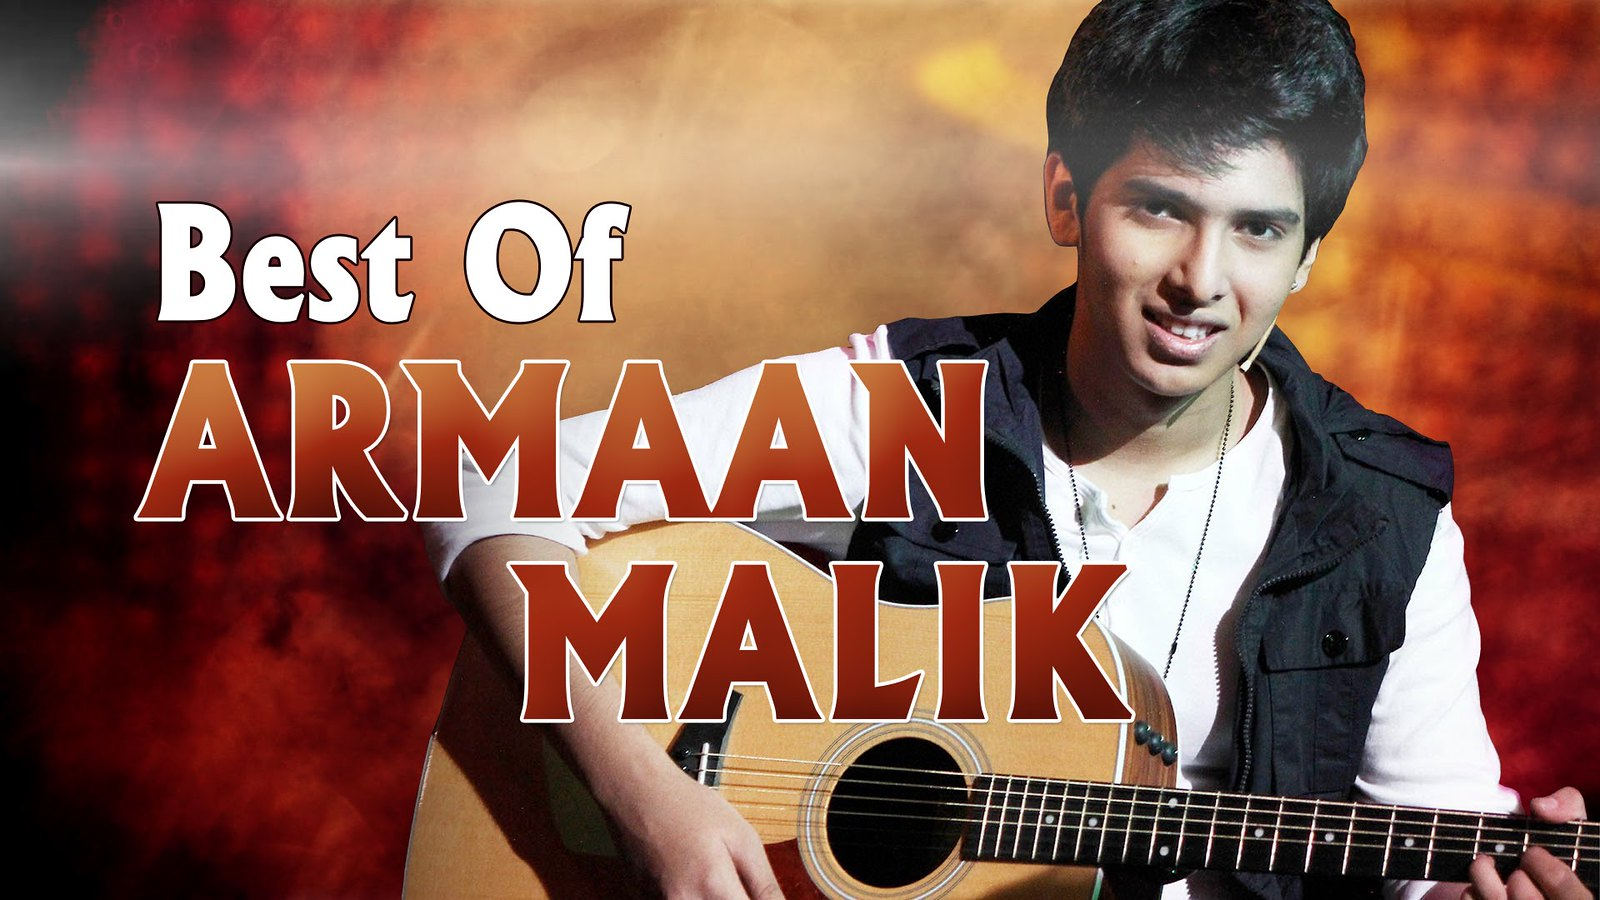 Armaan Malik HD Wallpapers